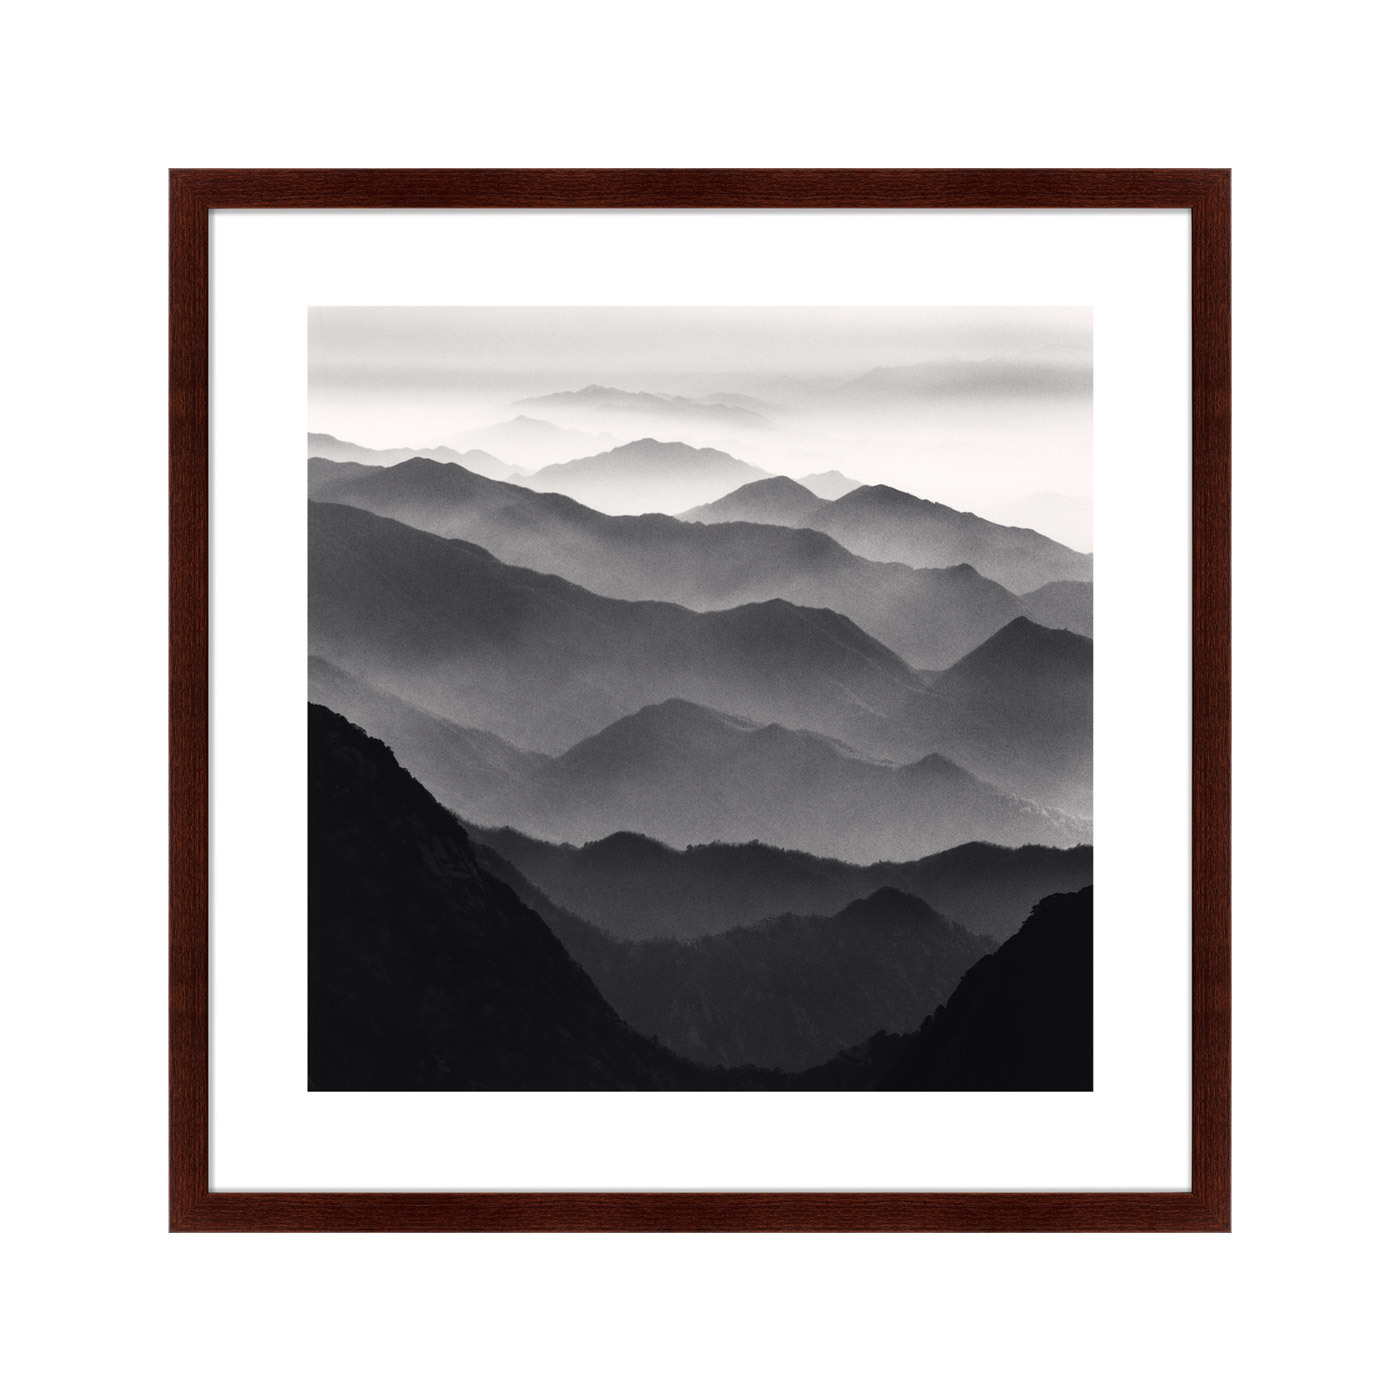 {} Картины в Квартиру Картина Huangshan Mountains (79х79 см) картины в квартиру картина каллы 2 35х35 см